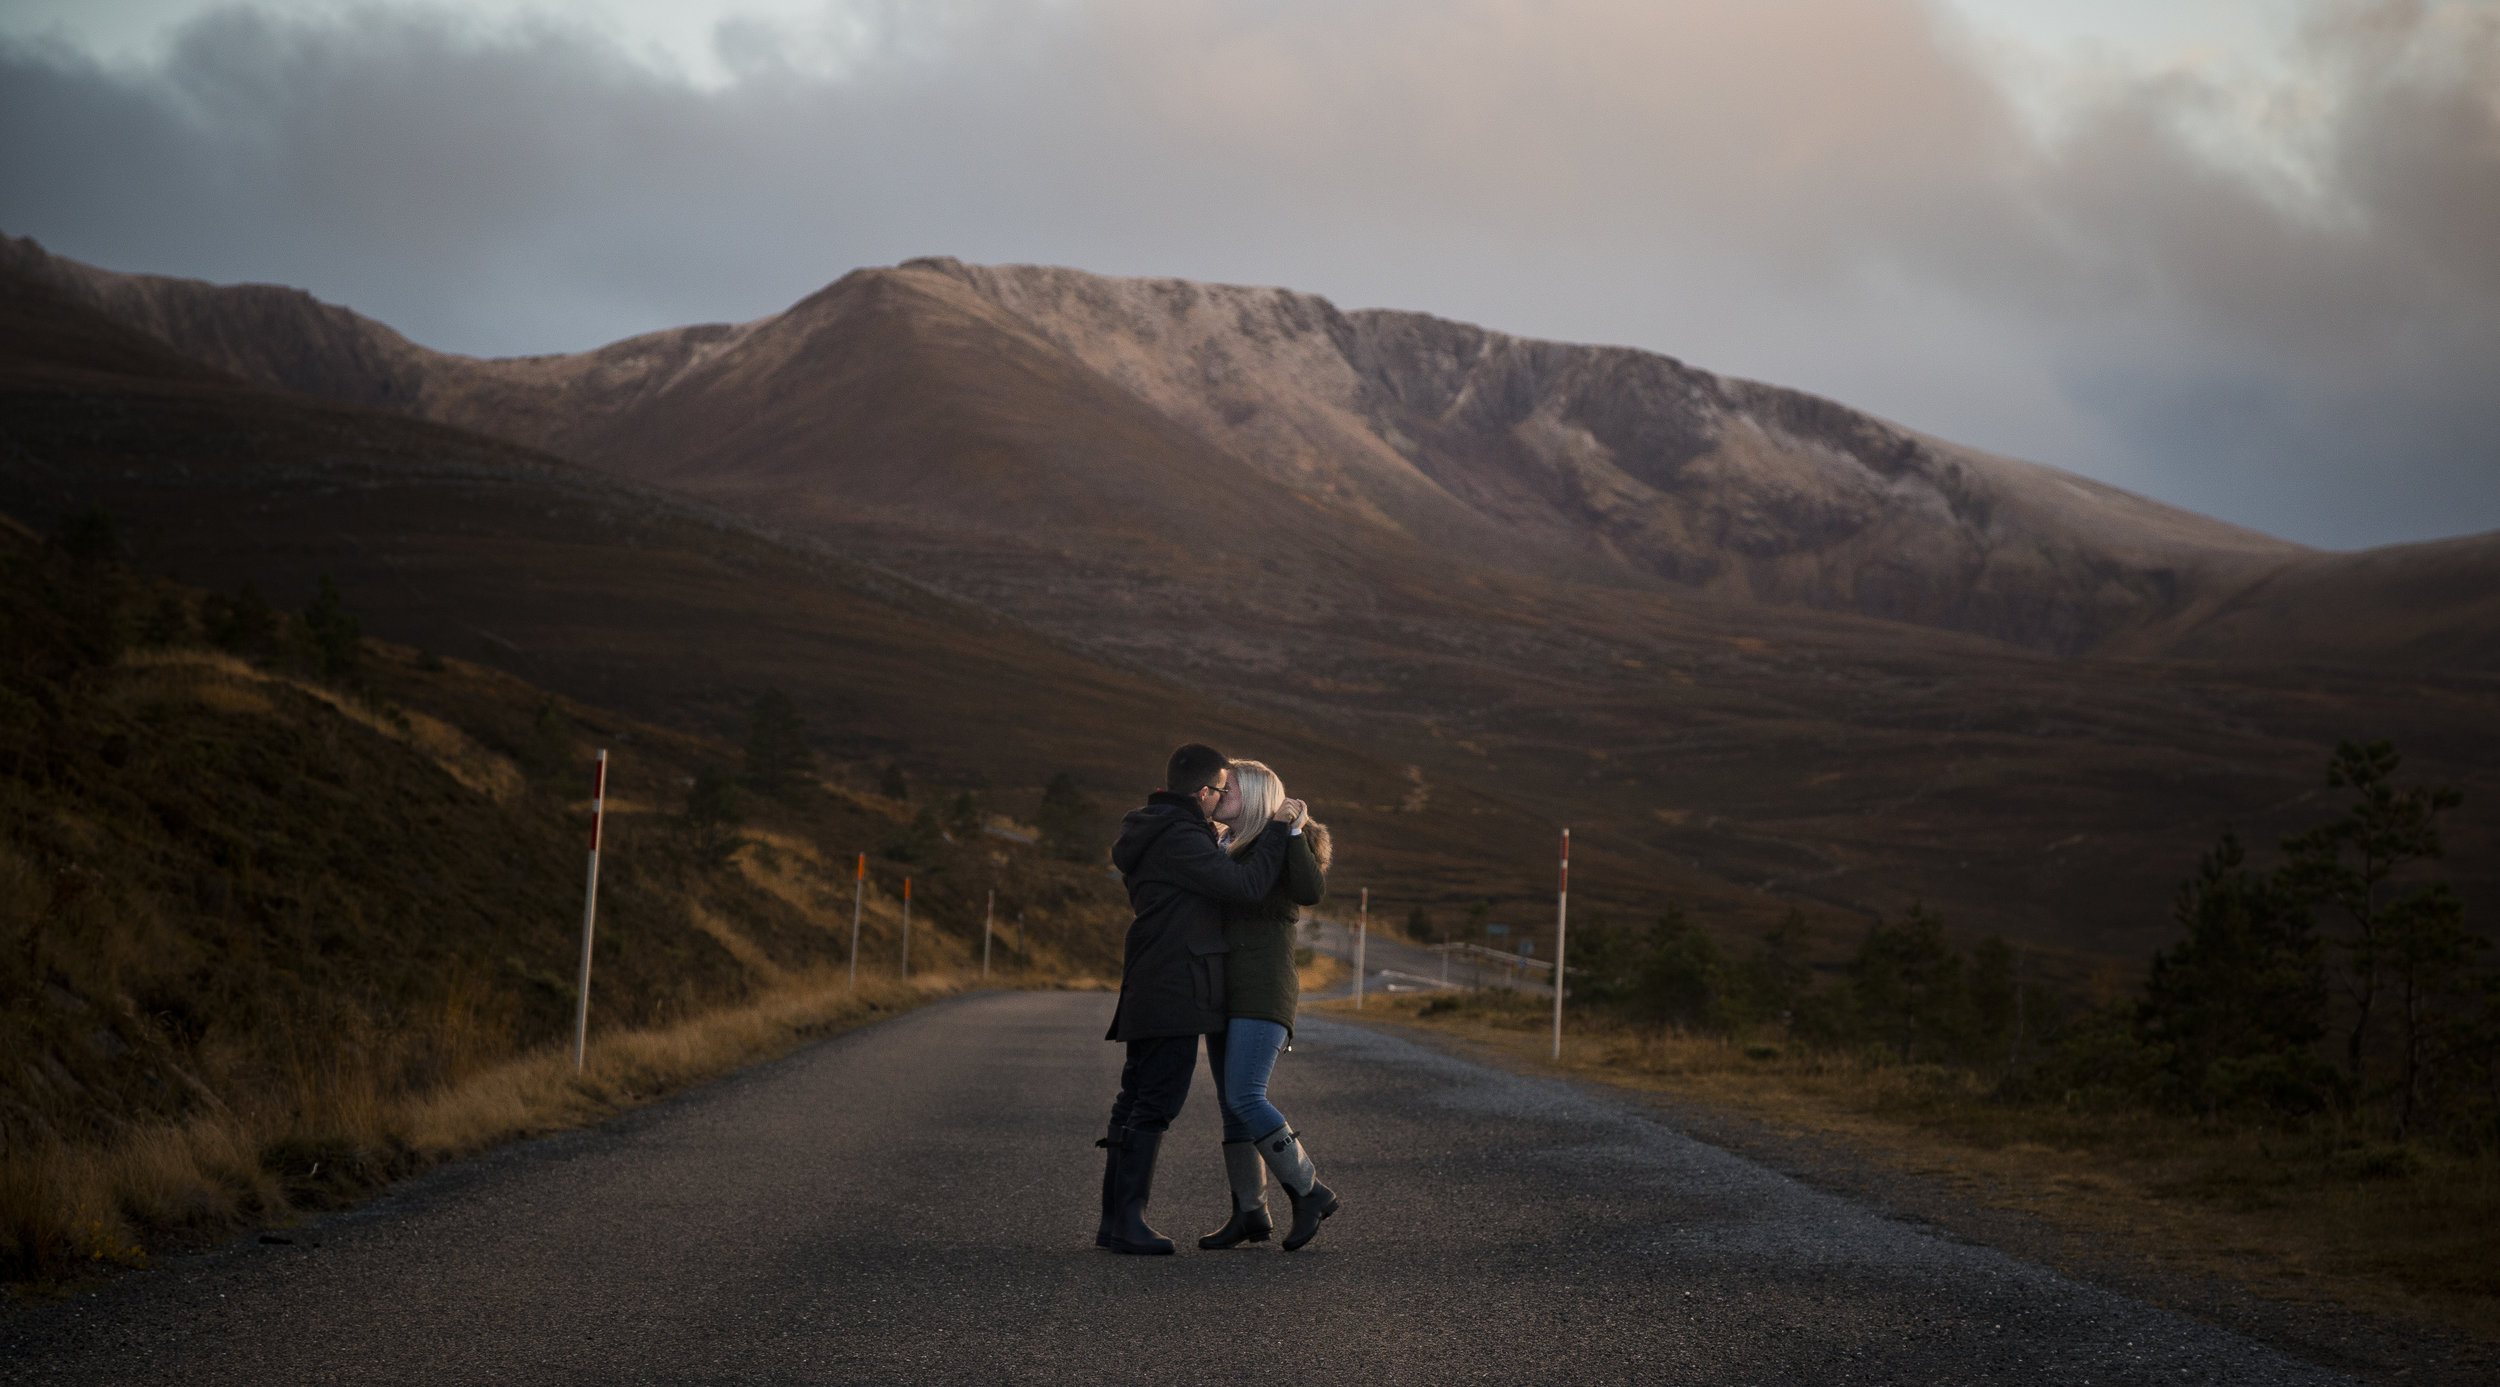 Natalie & Ewen Engagement Shoot, Aviemore